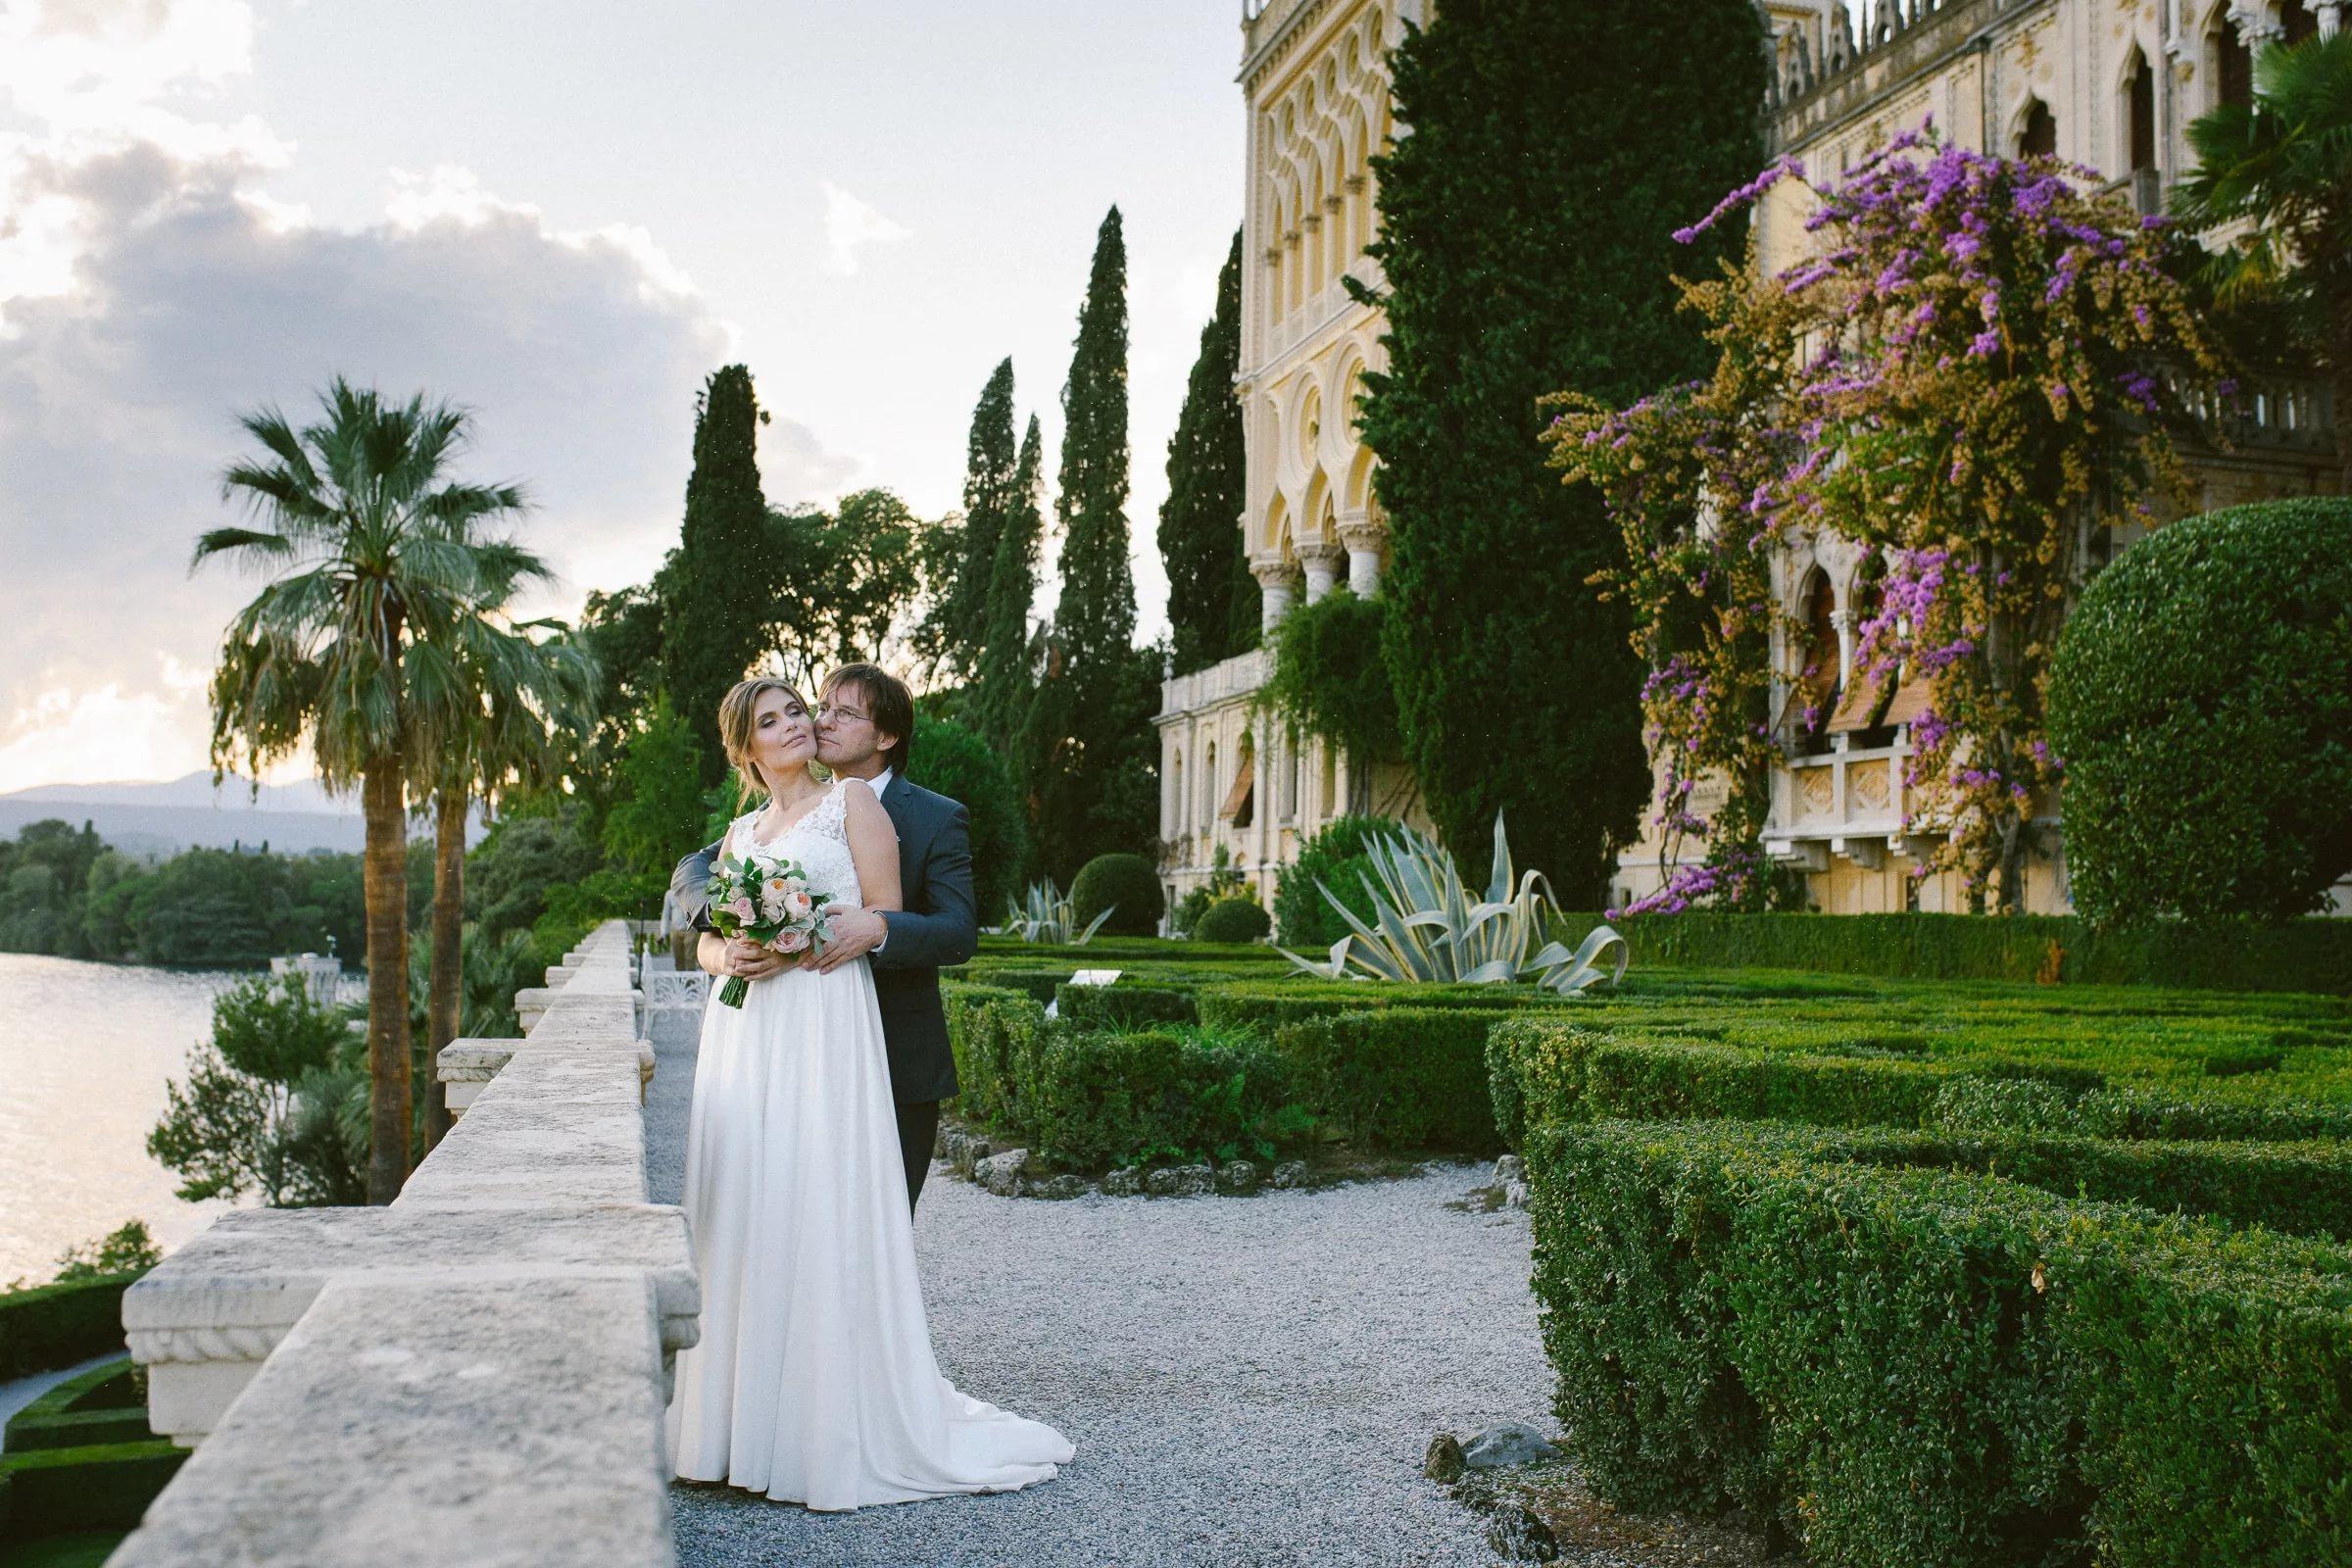 Svadba na ville borgese ostrov Garda (17)